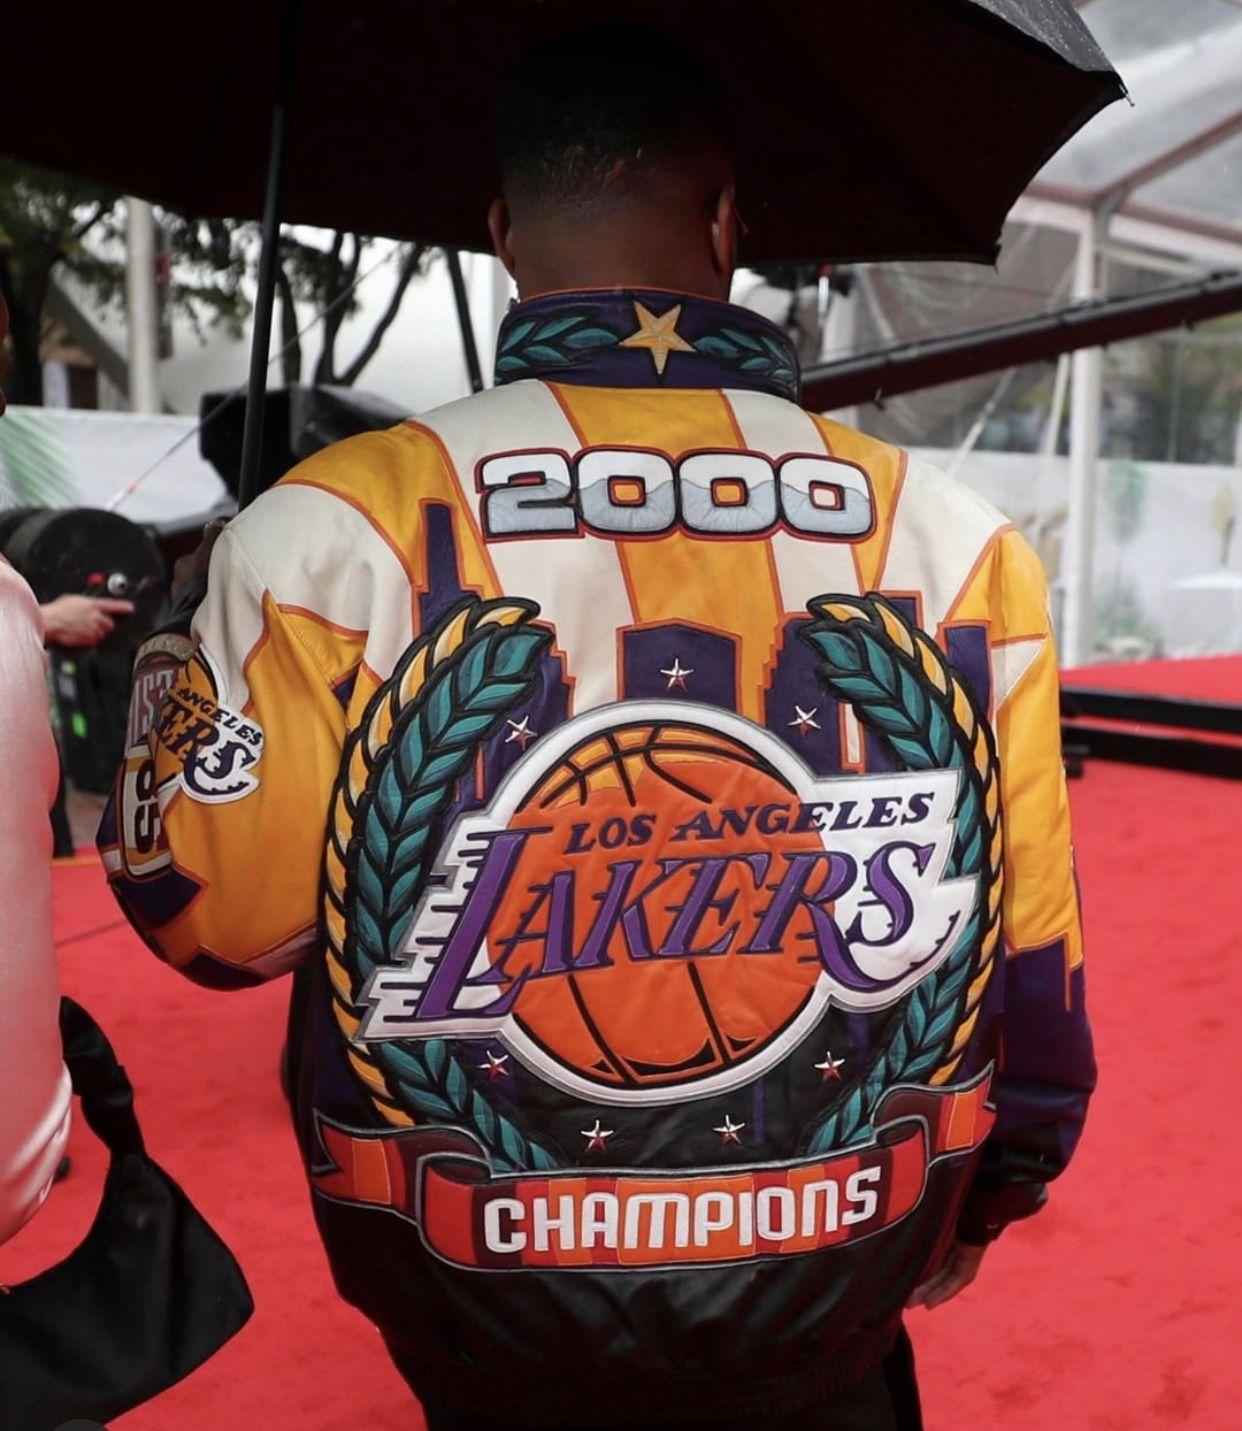 Pin By B C On We Playin Basketball In 2020 Kobe Kobe Bryant Sports Jersey